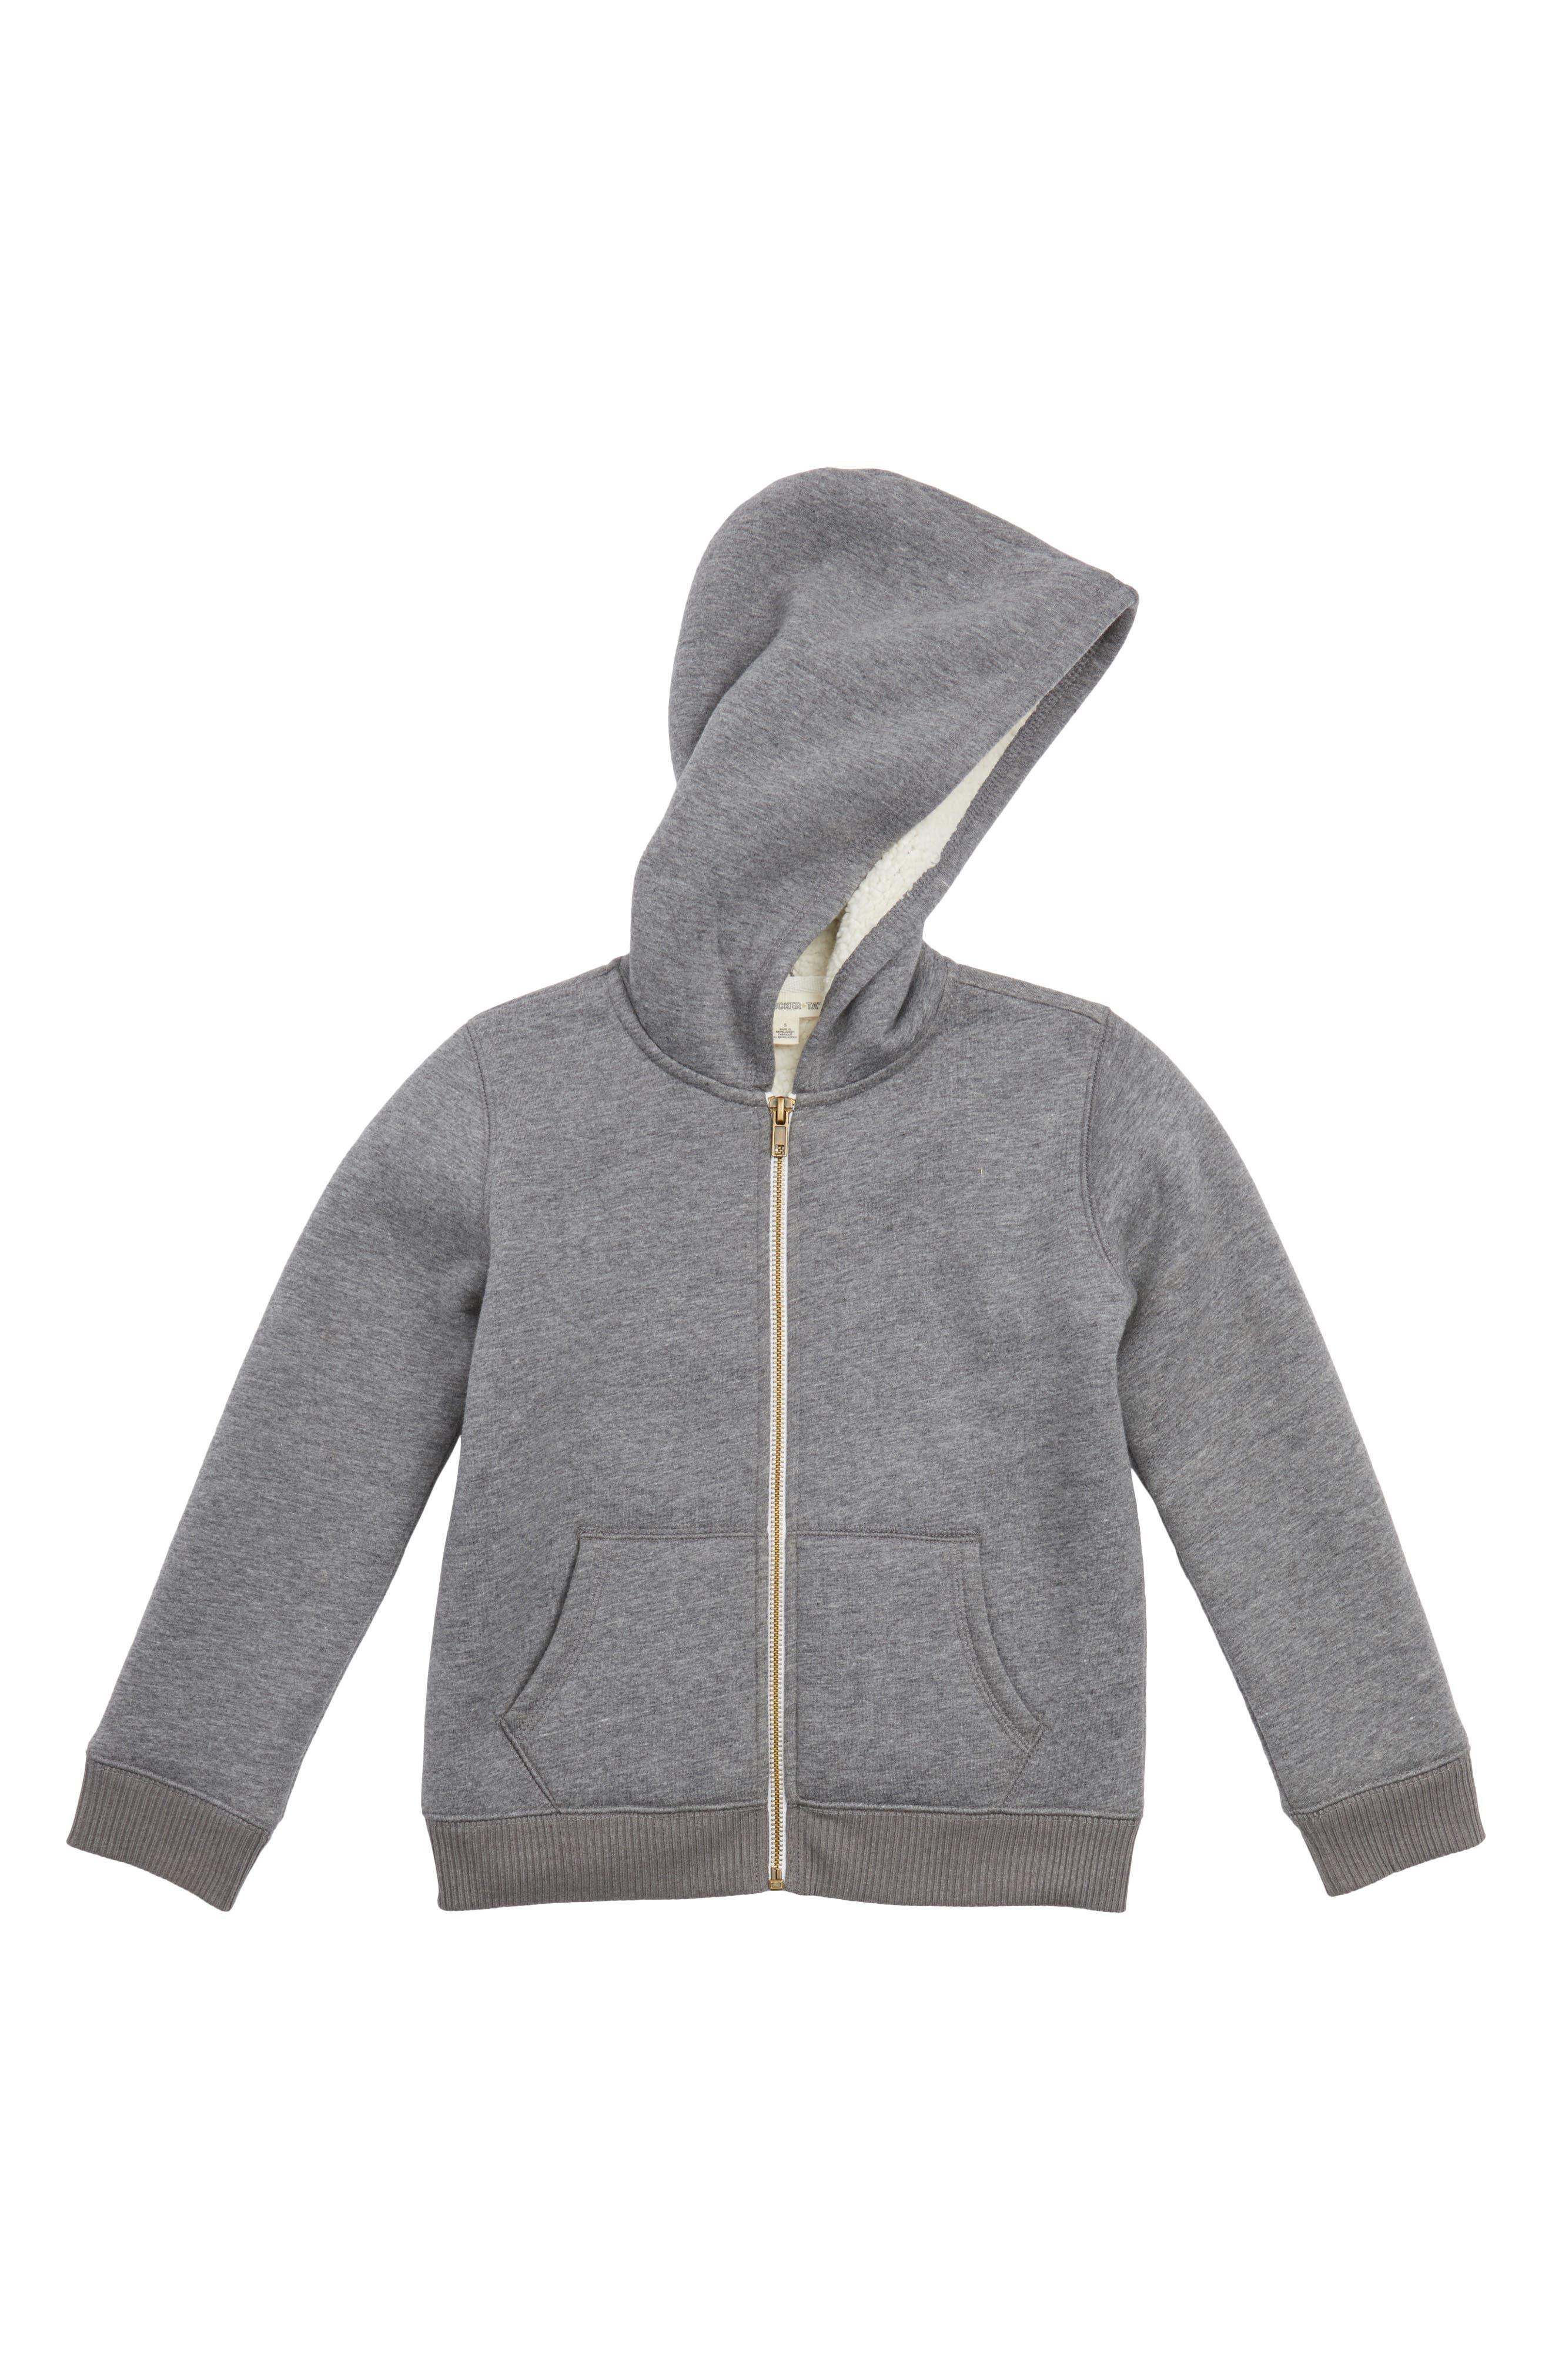 Plush Lined Zip Hoodie,                         Main,                         color, 030